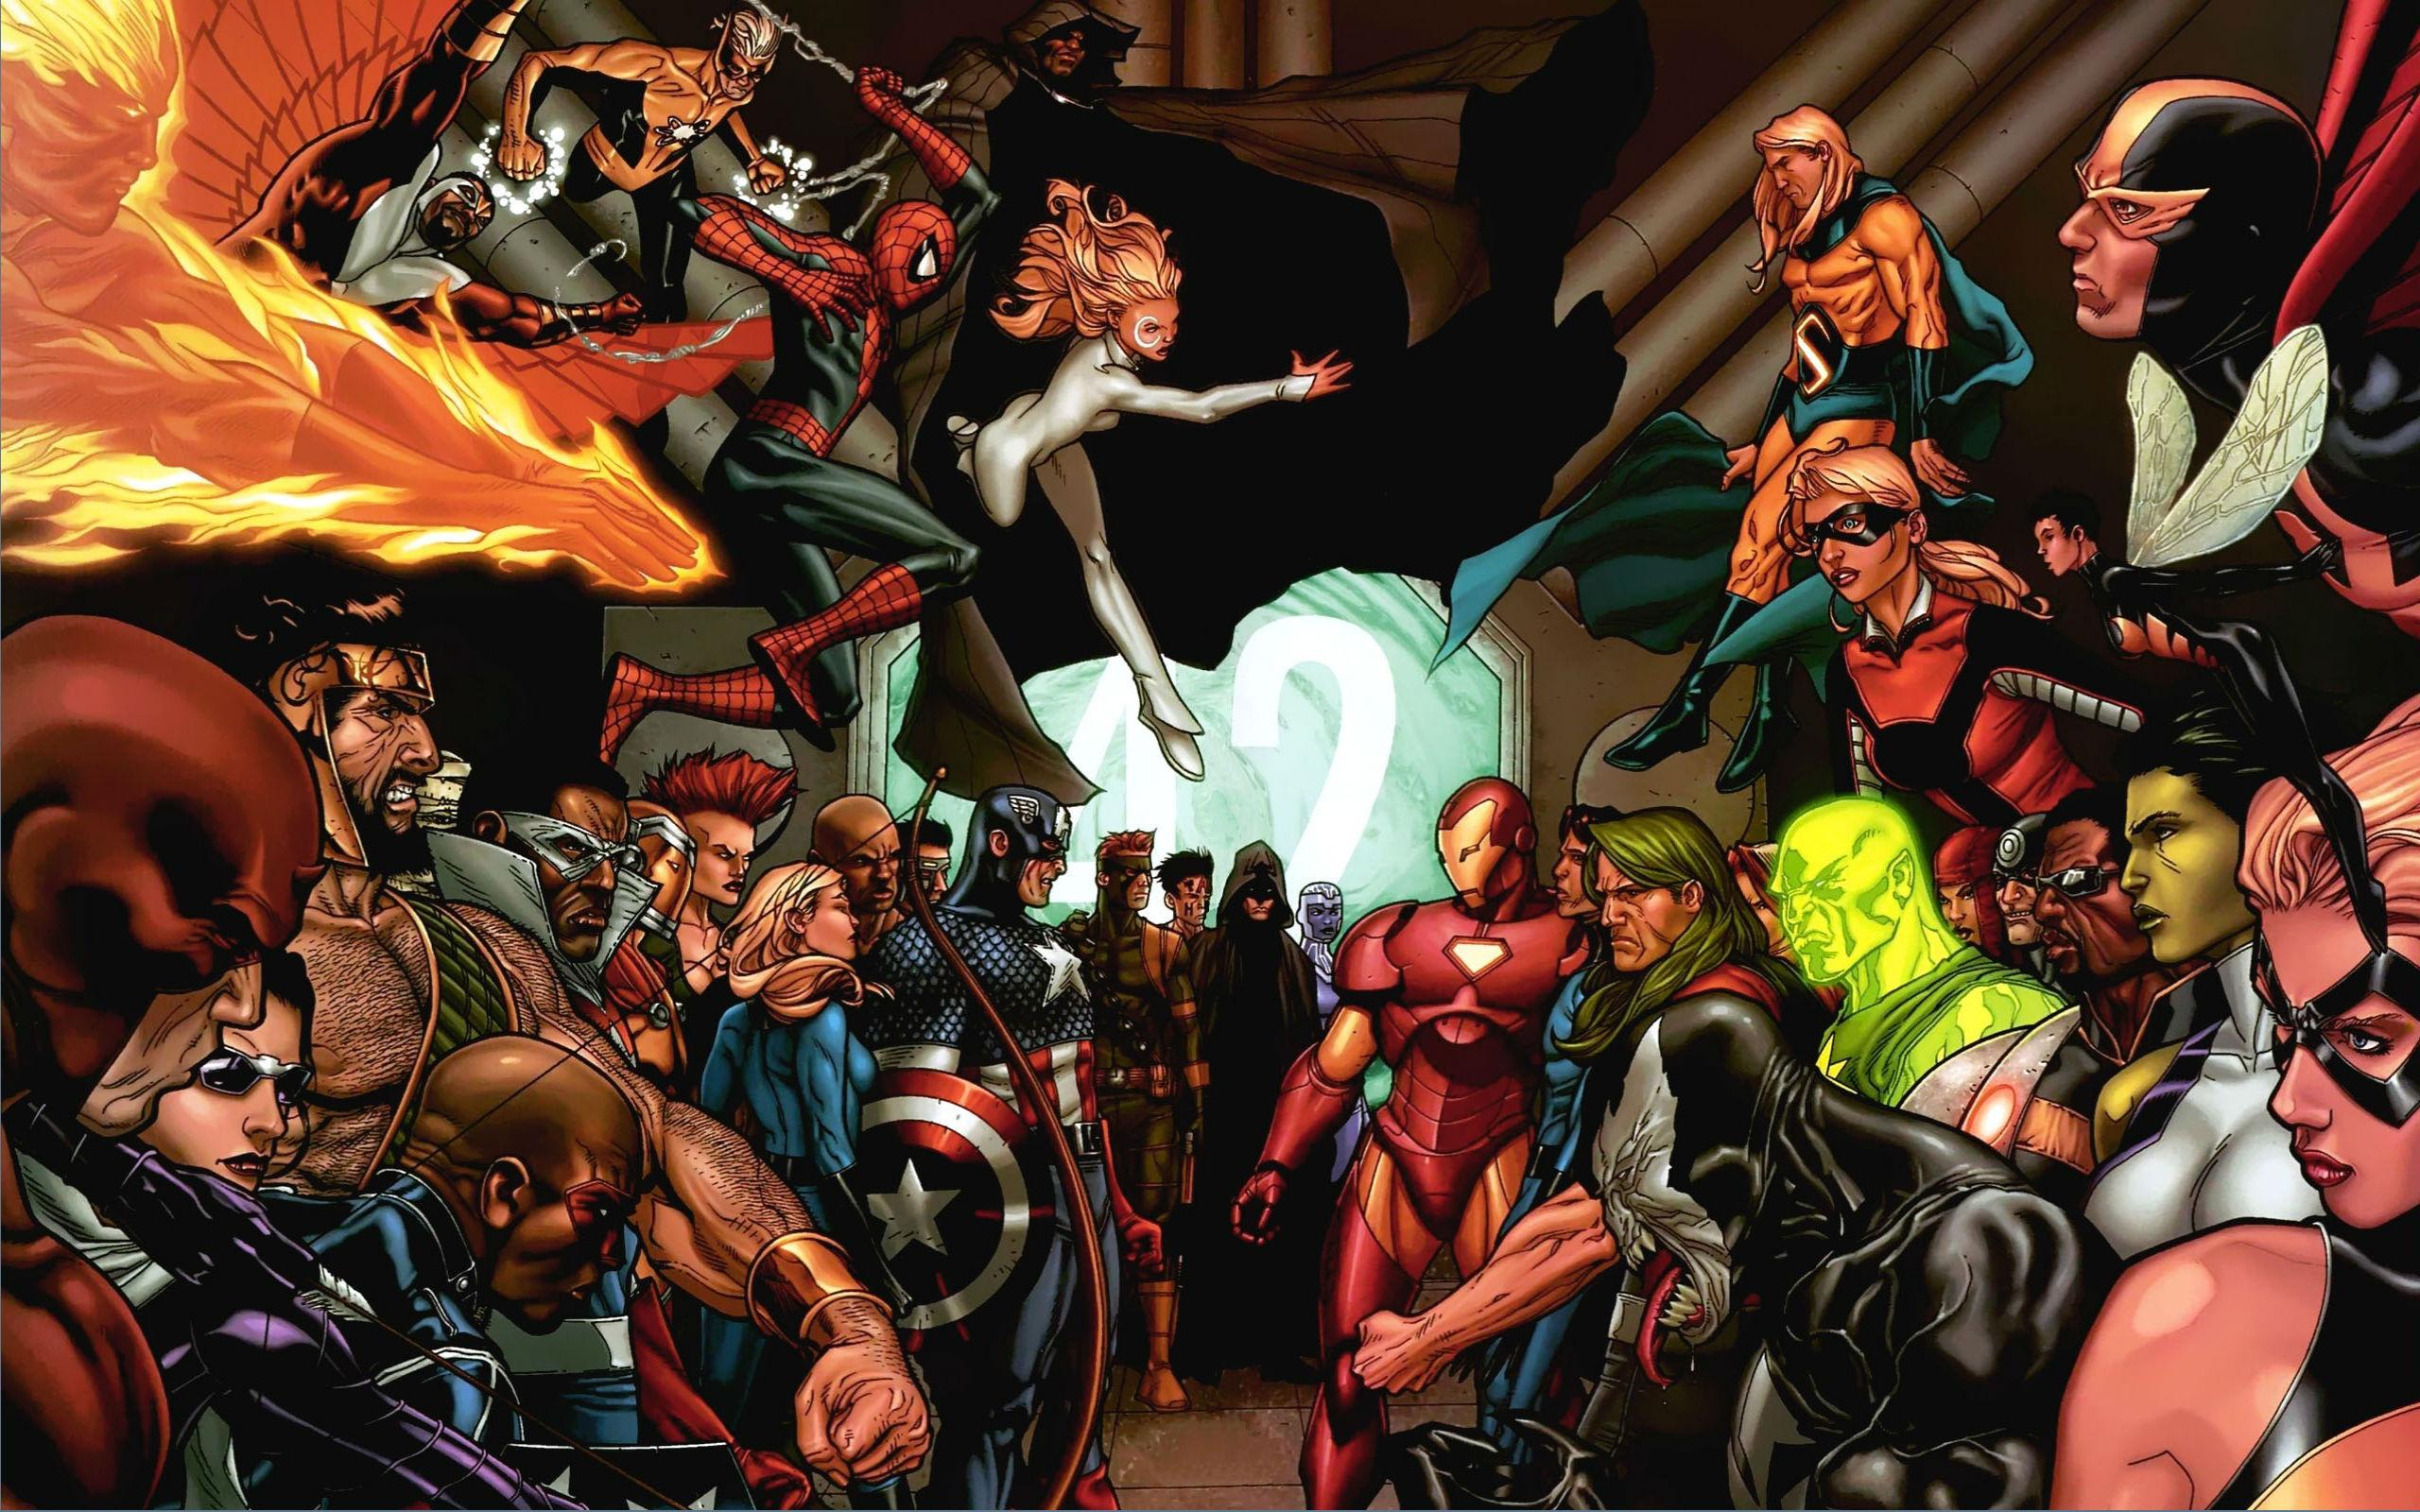 Marvel Civil War Computer Wallpapers Desktop Backgrounds 2560x1600 2560x1600